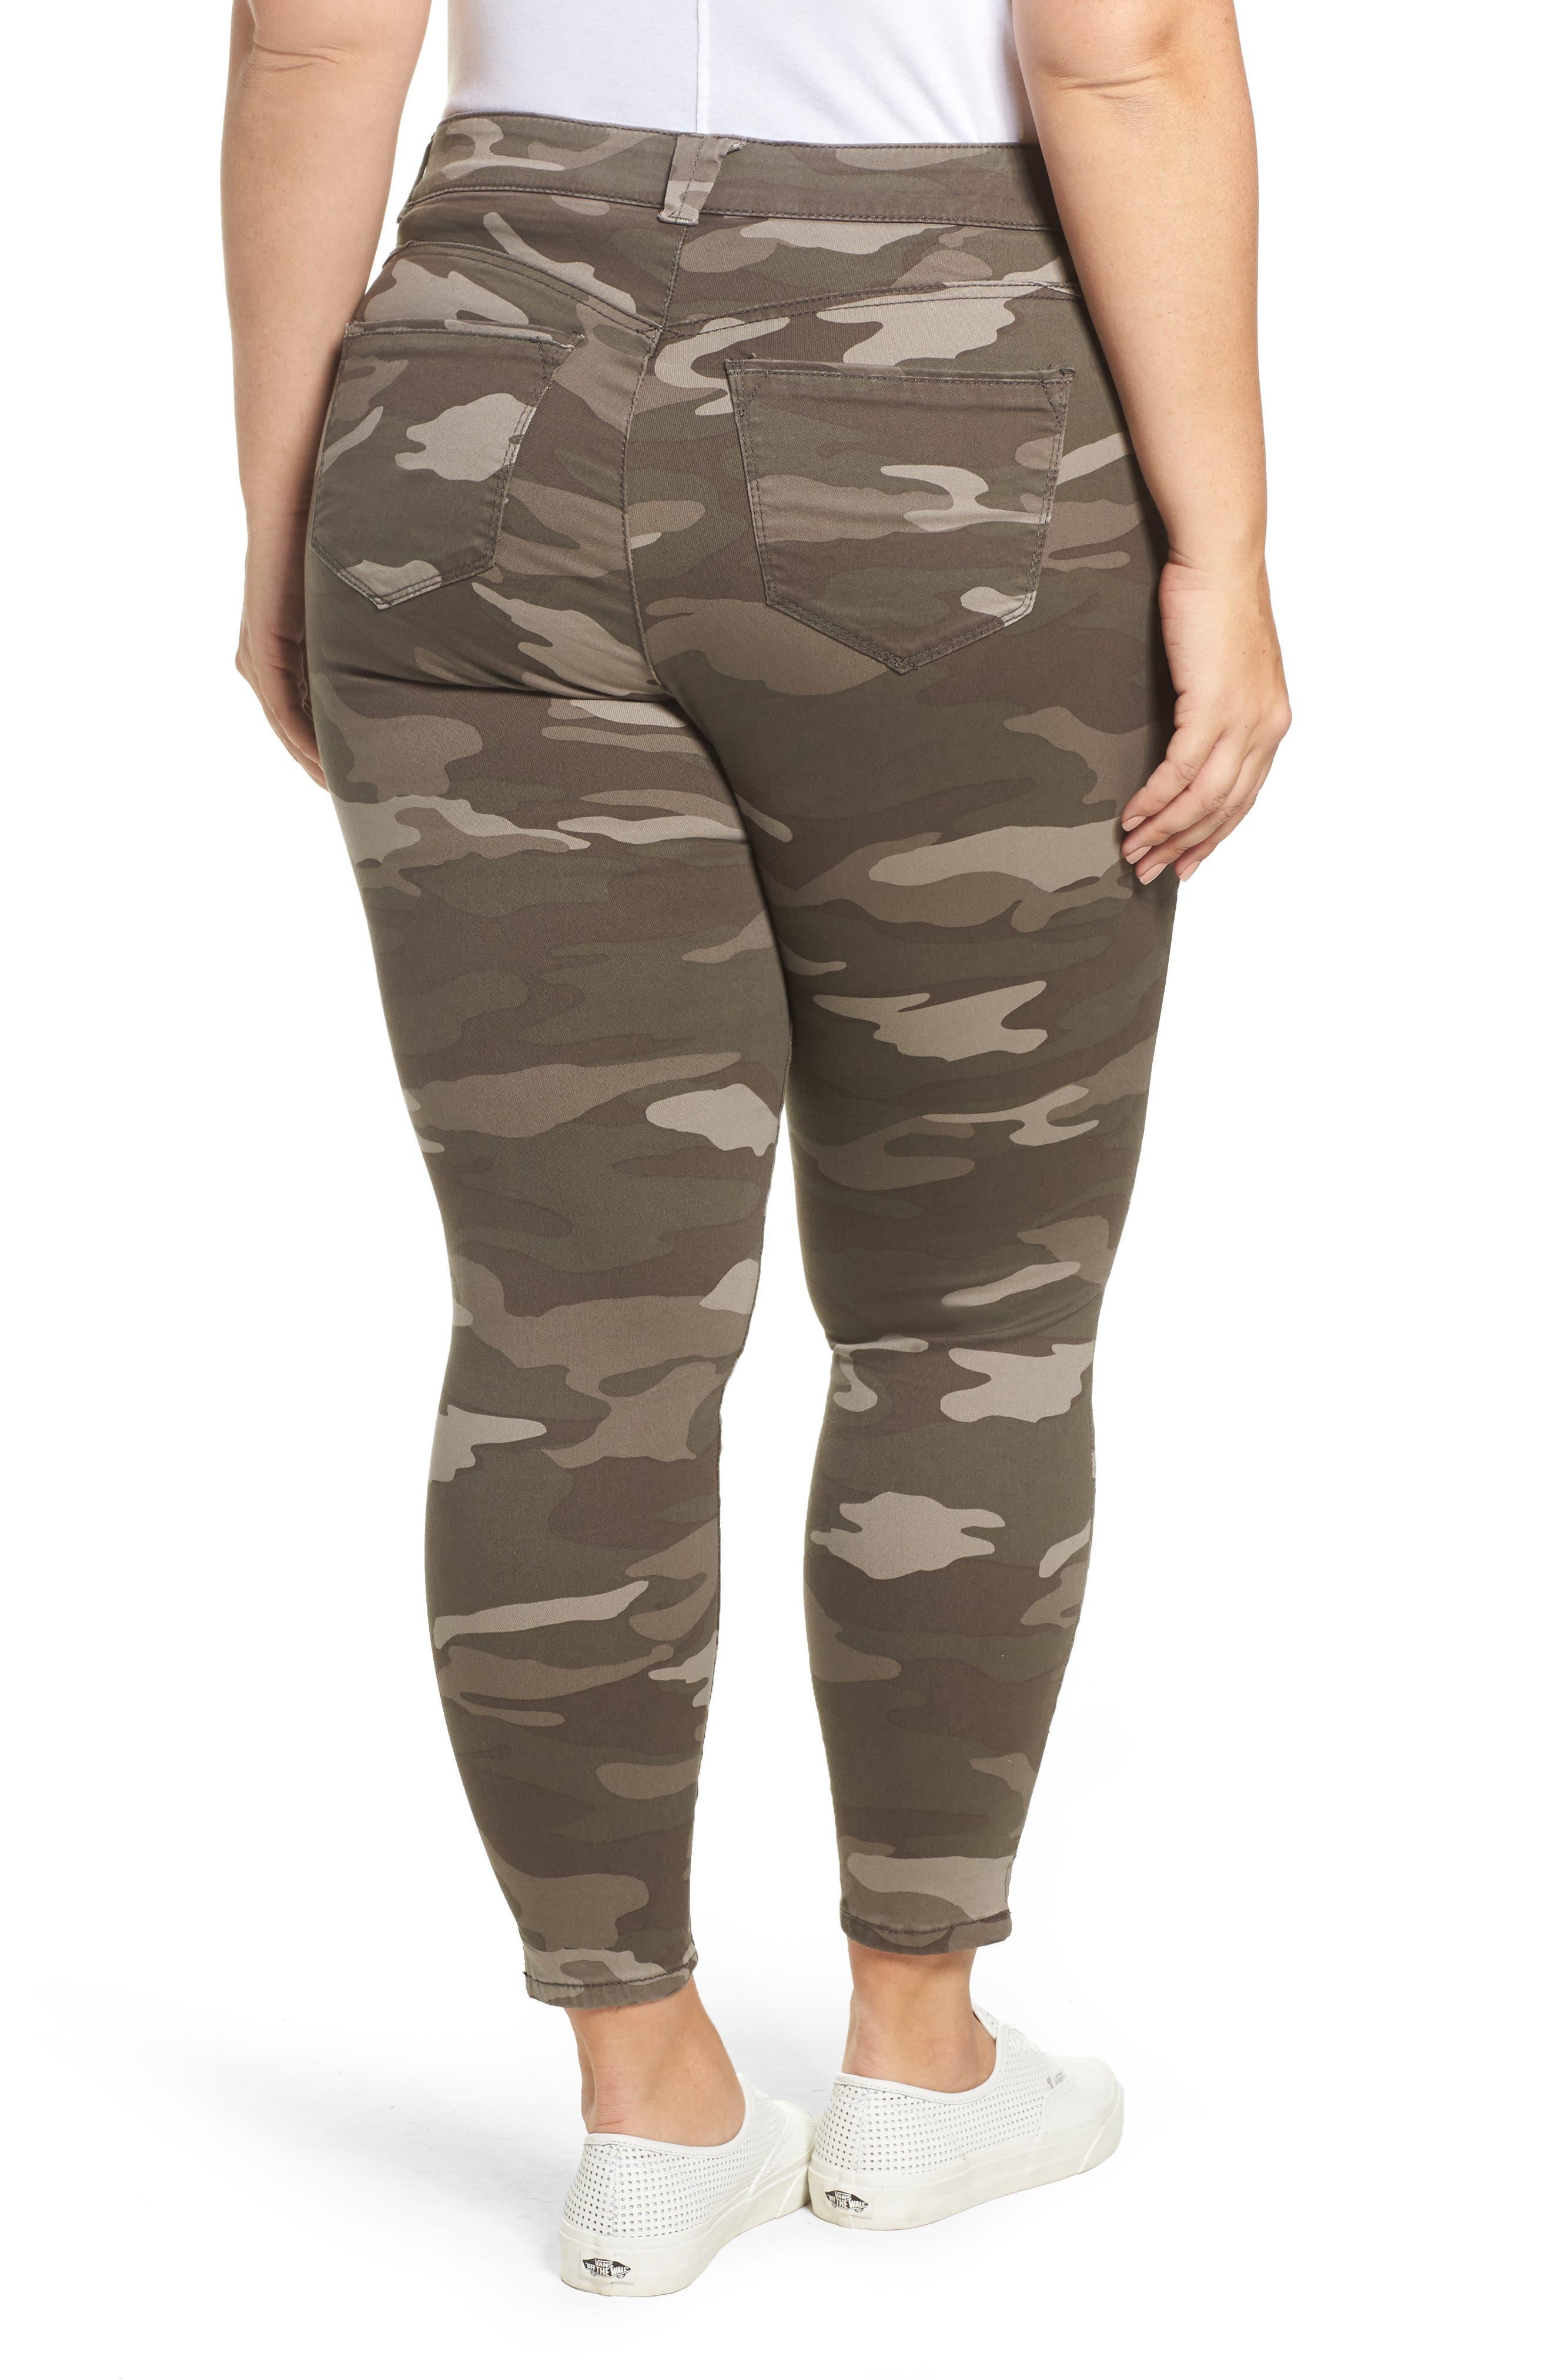 Ab-solution Camo Skinny Pants,                             Alternate thumbnail 2, color,                             250